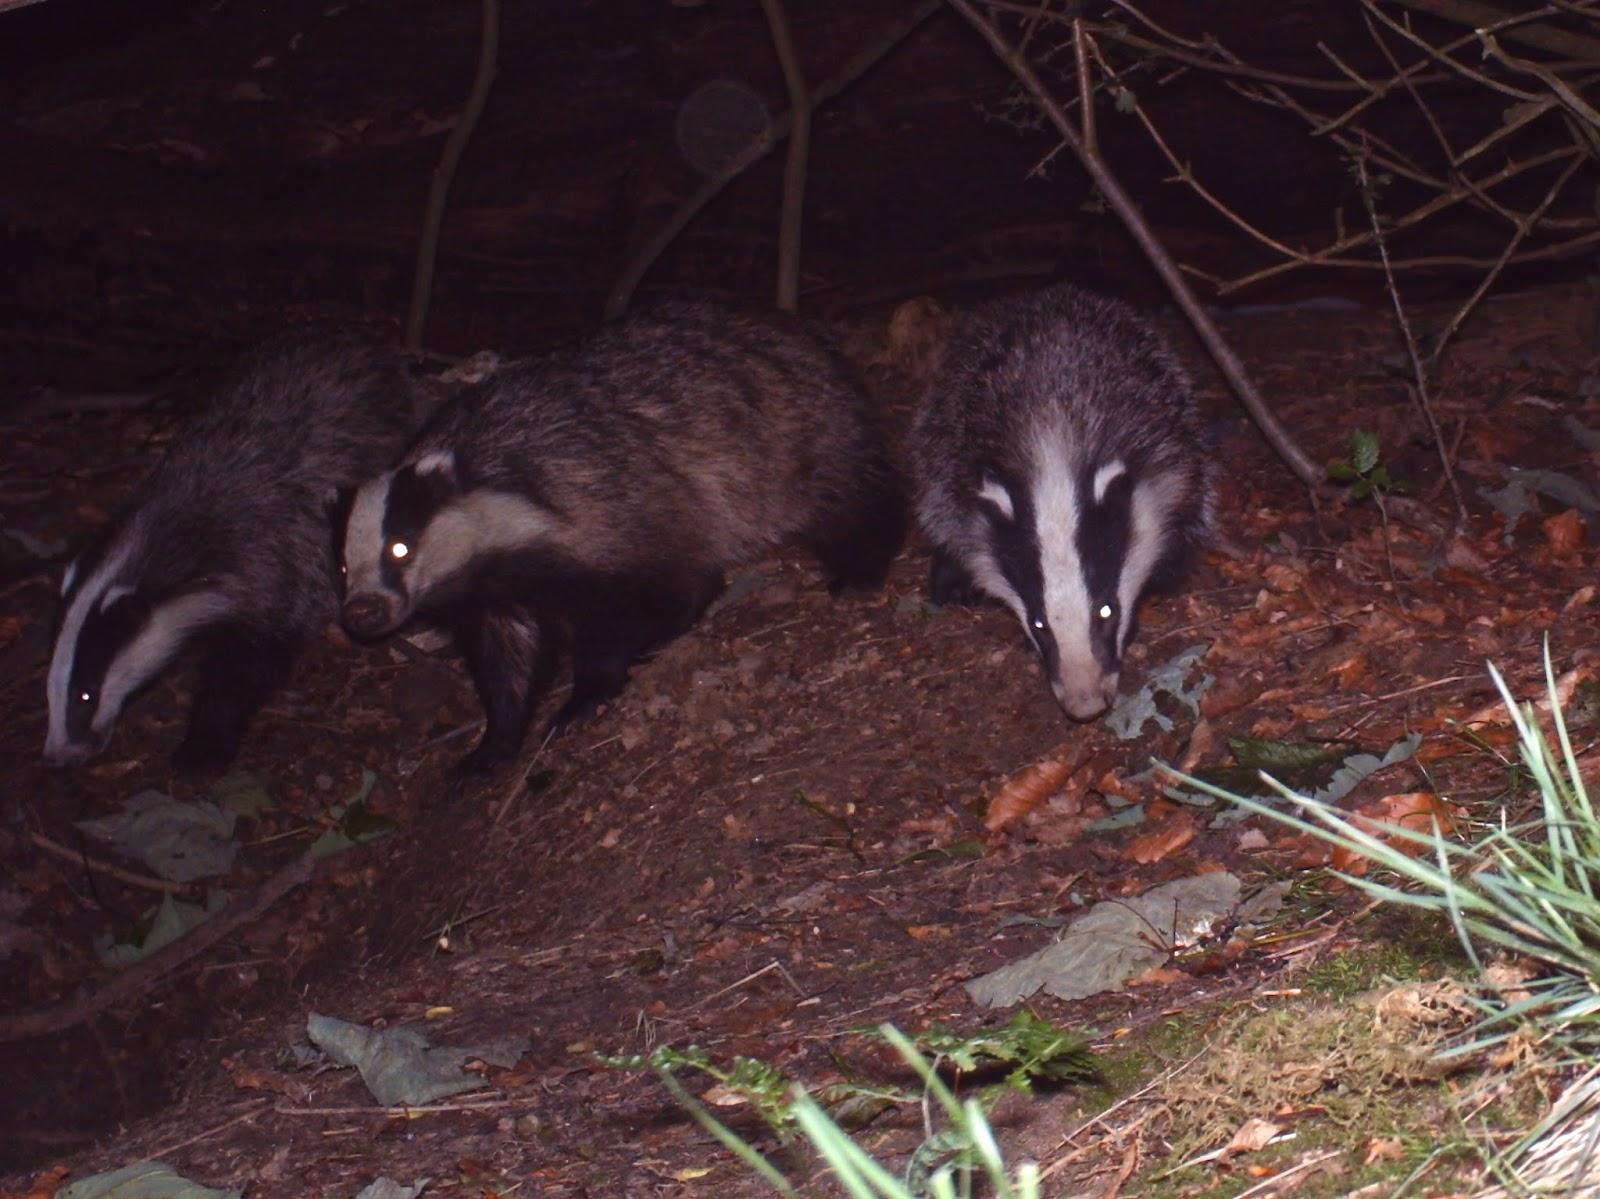 TrogTrogBlog: More badgers on BadgerCam